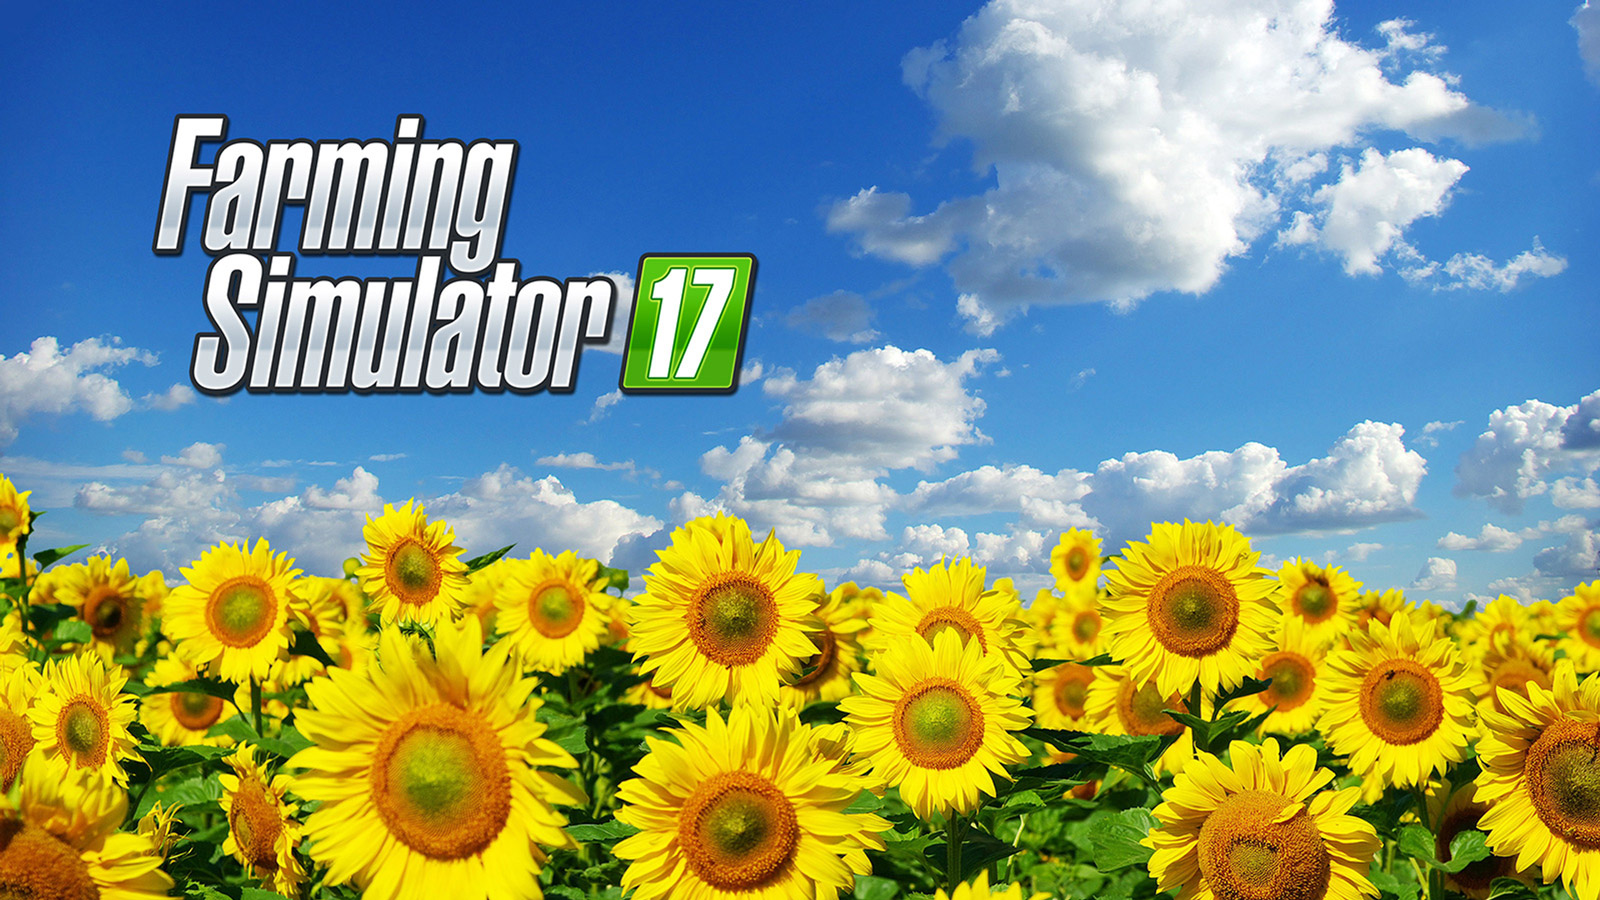 Free Farming Simulator 17 Wallpaper in 1600x900